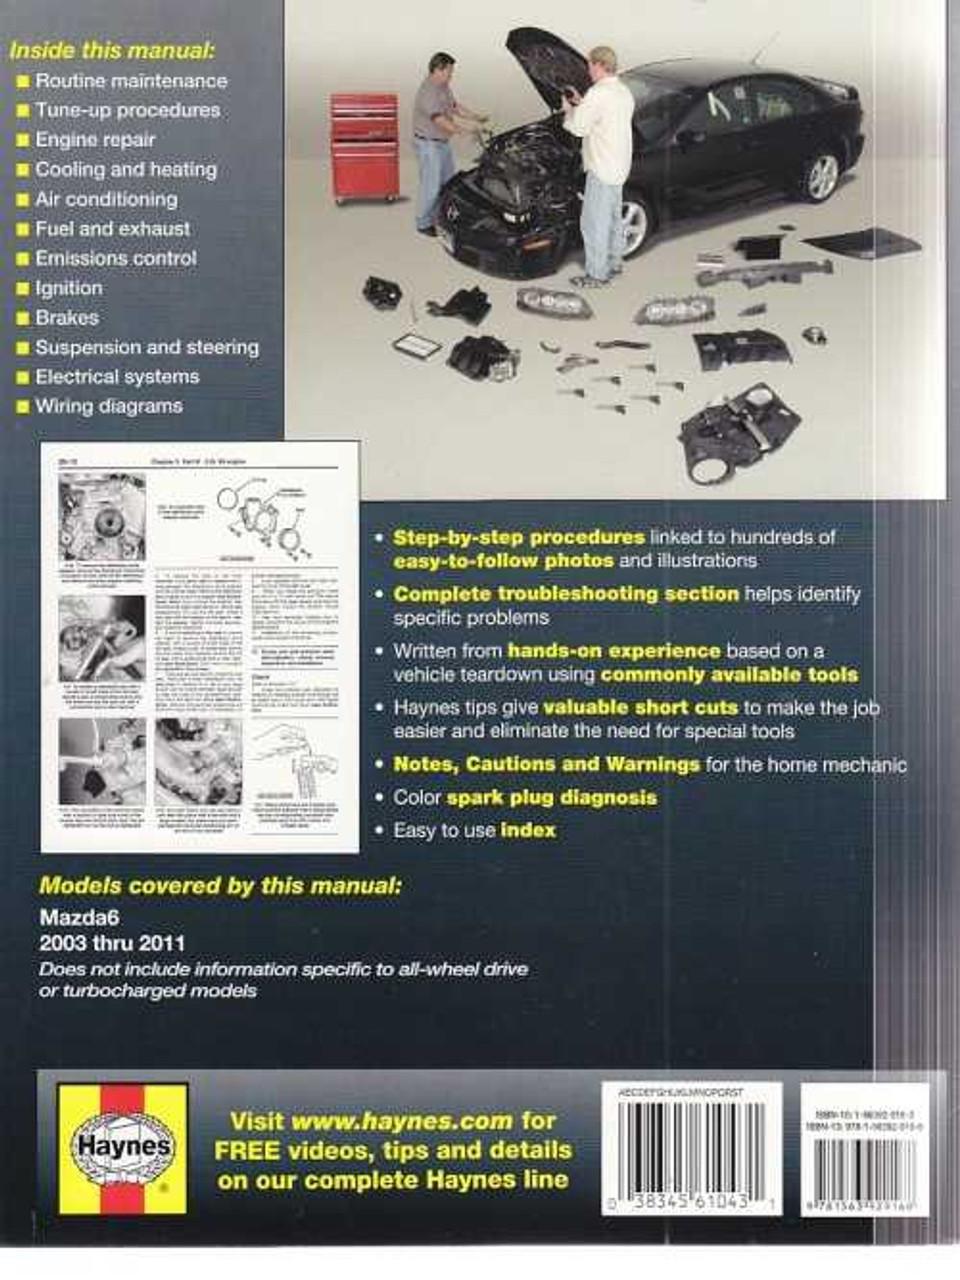 Mazda6 2003 - 2011 Workshop Manual